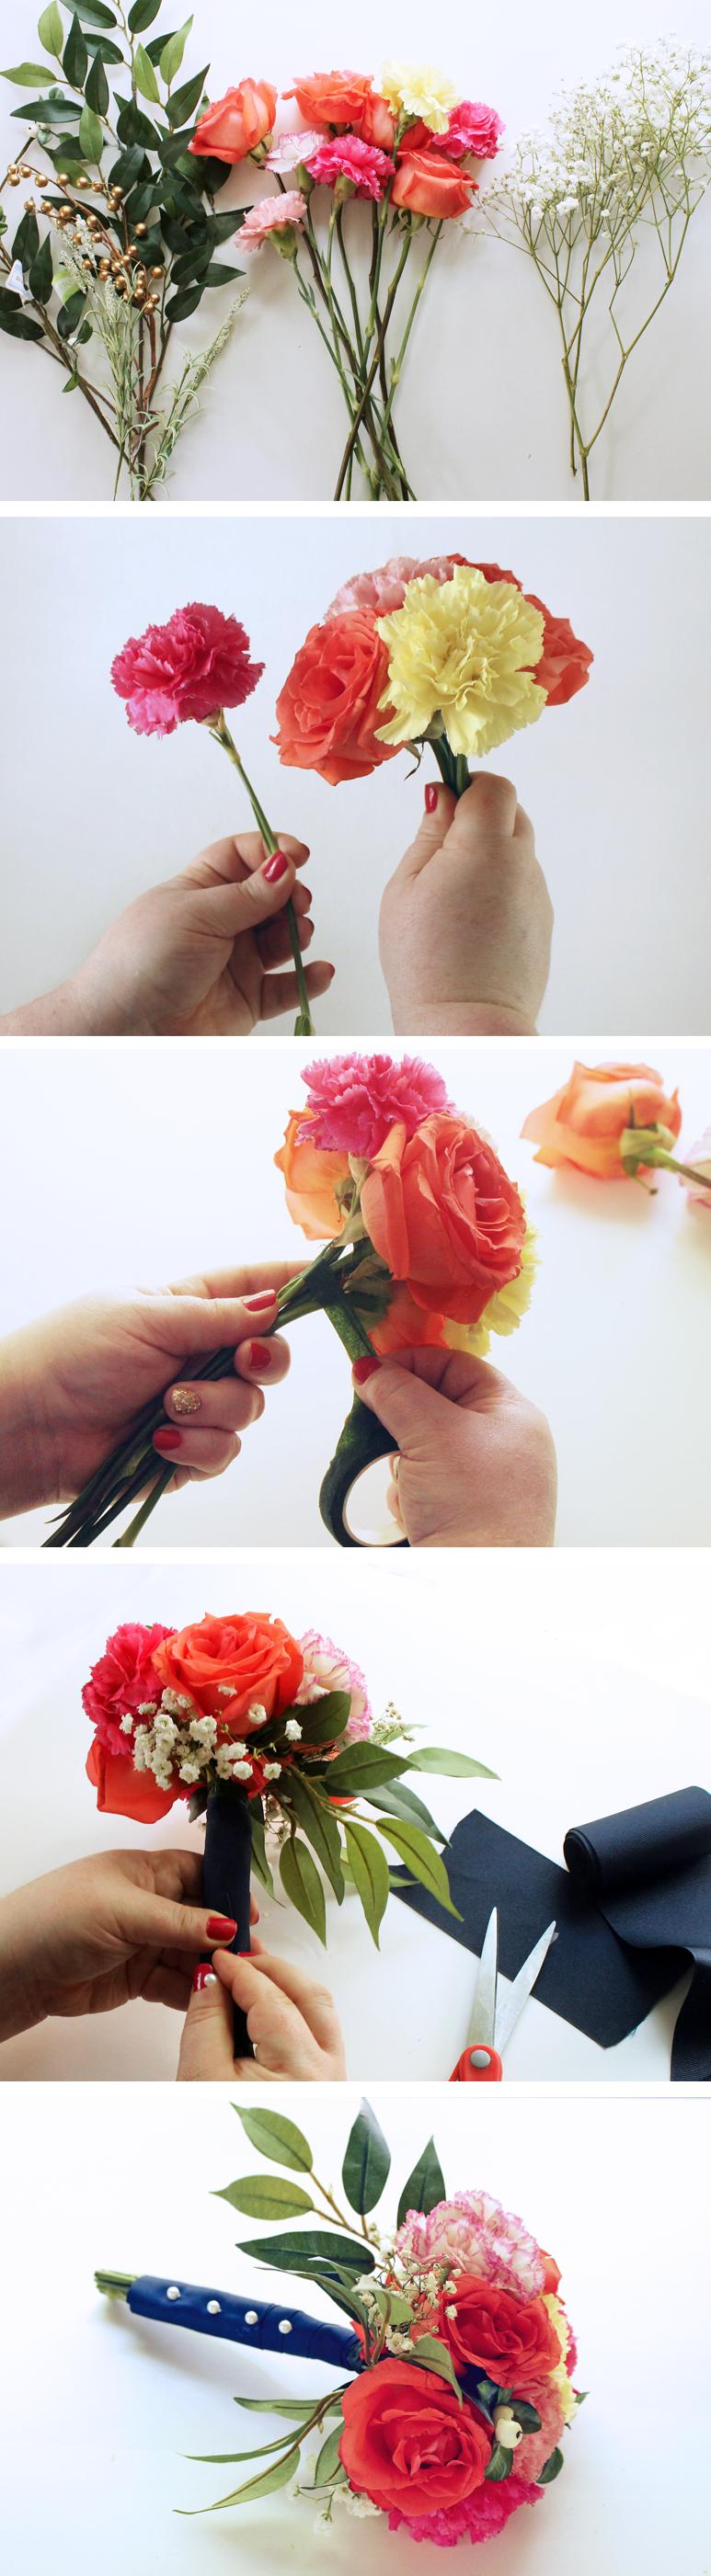 Make Your Own Wedding Bouquet Diy wedding bouquet, Diy